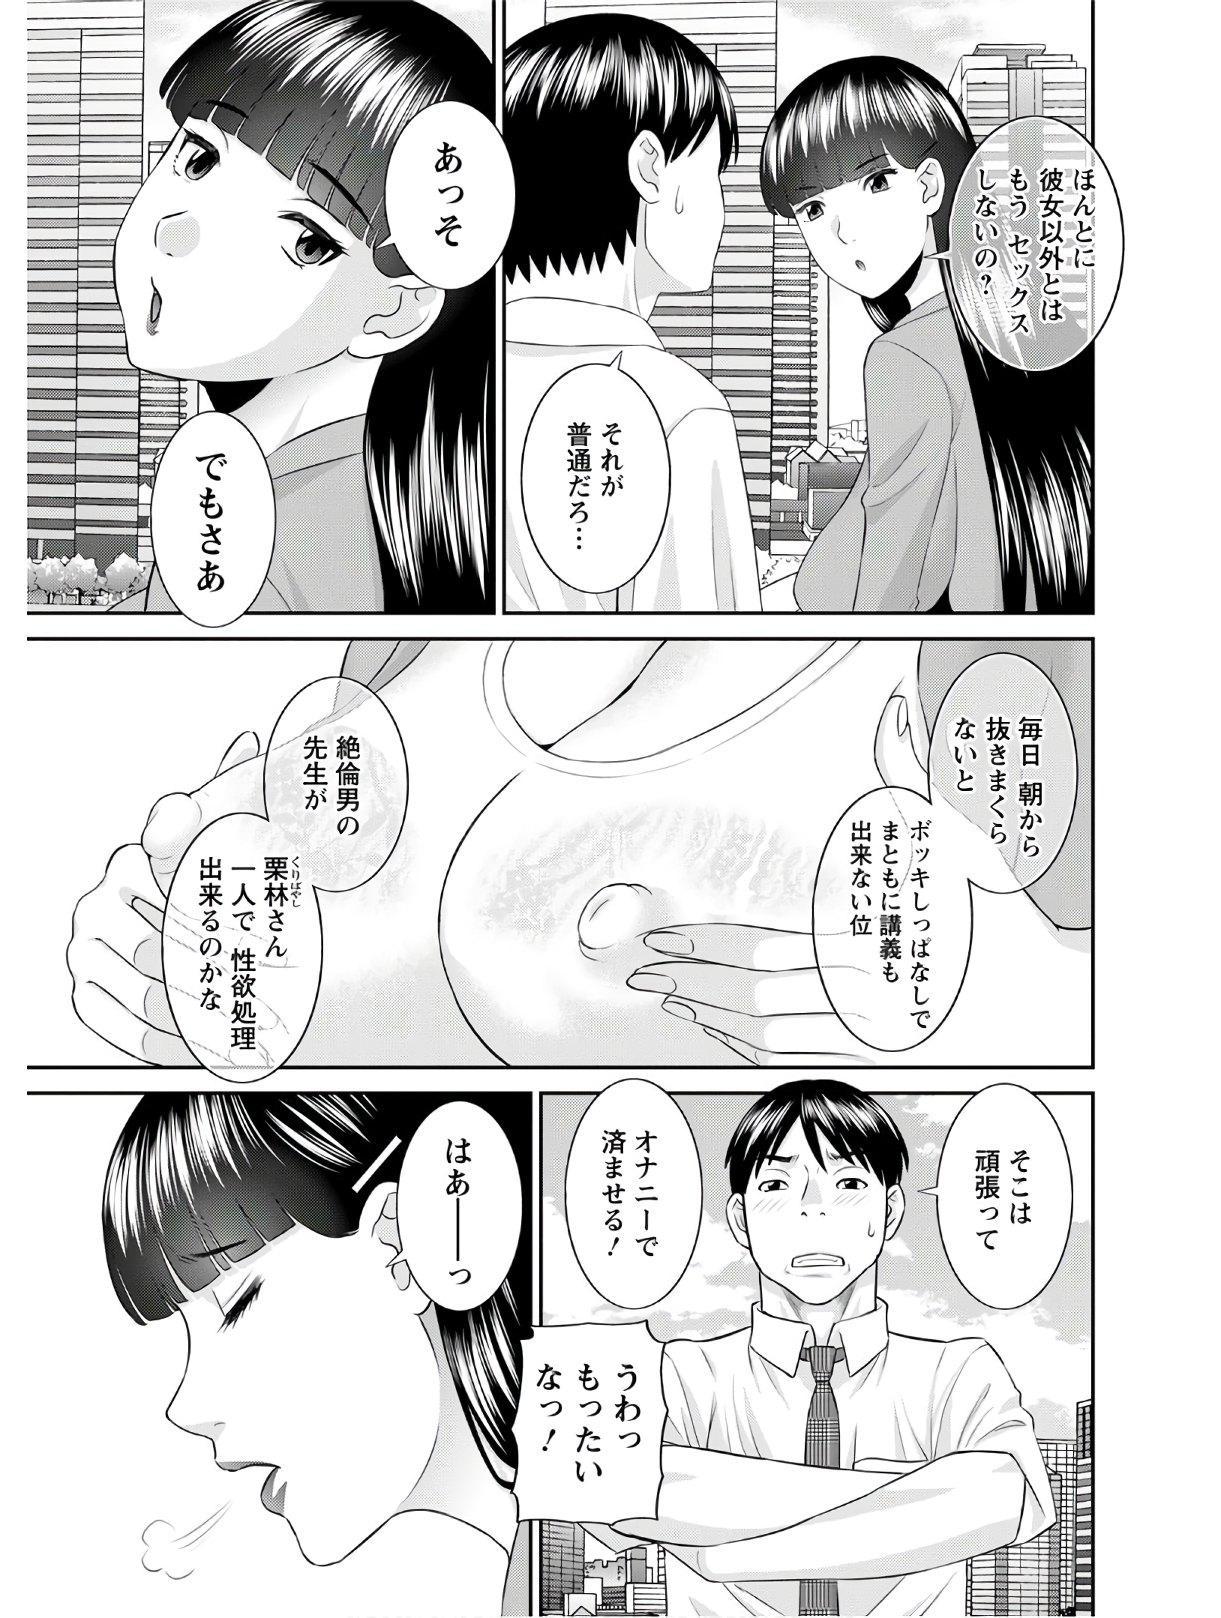 [Kawamori Misaki] Kaikan Hitotsuma Gakuen Ch. 1-6, 8-20 [Digital] 299